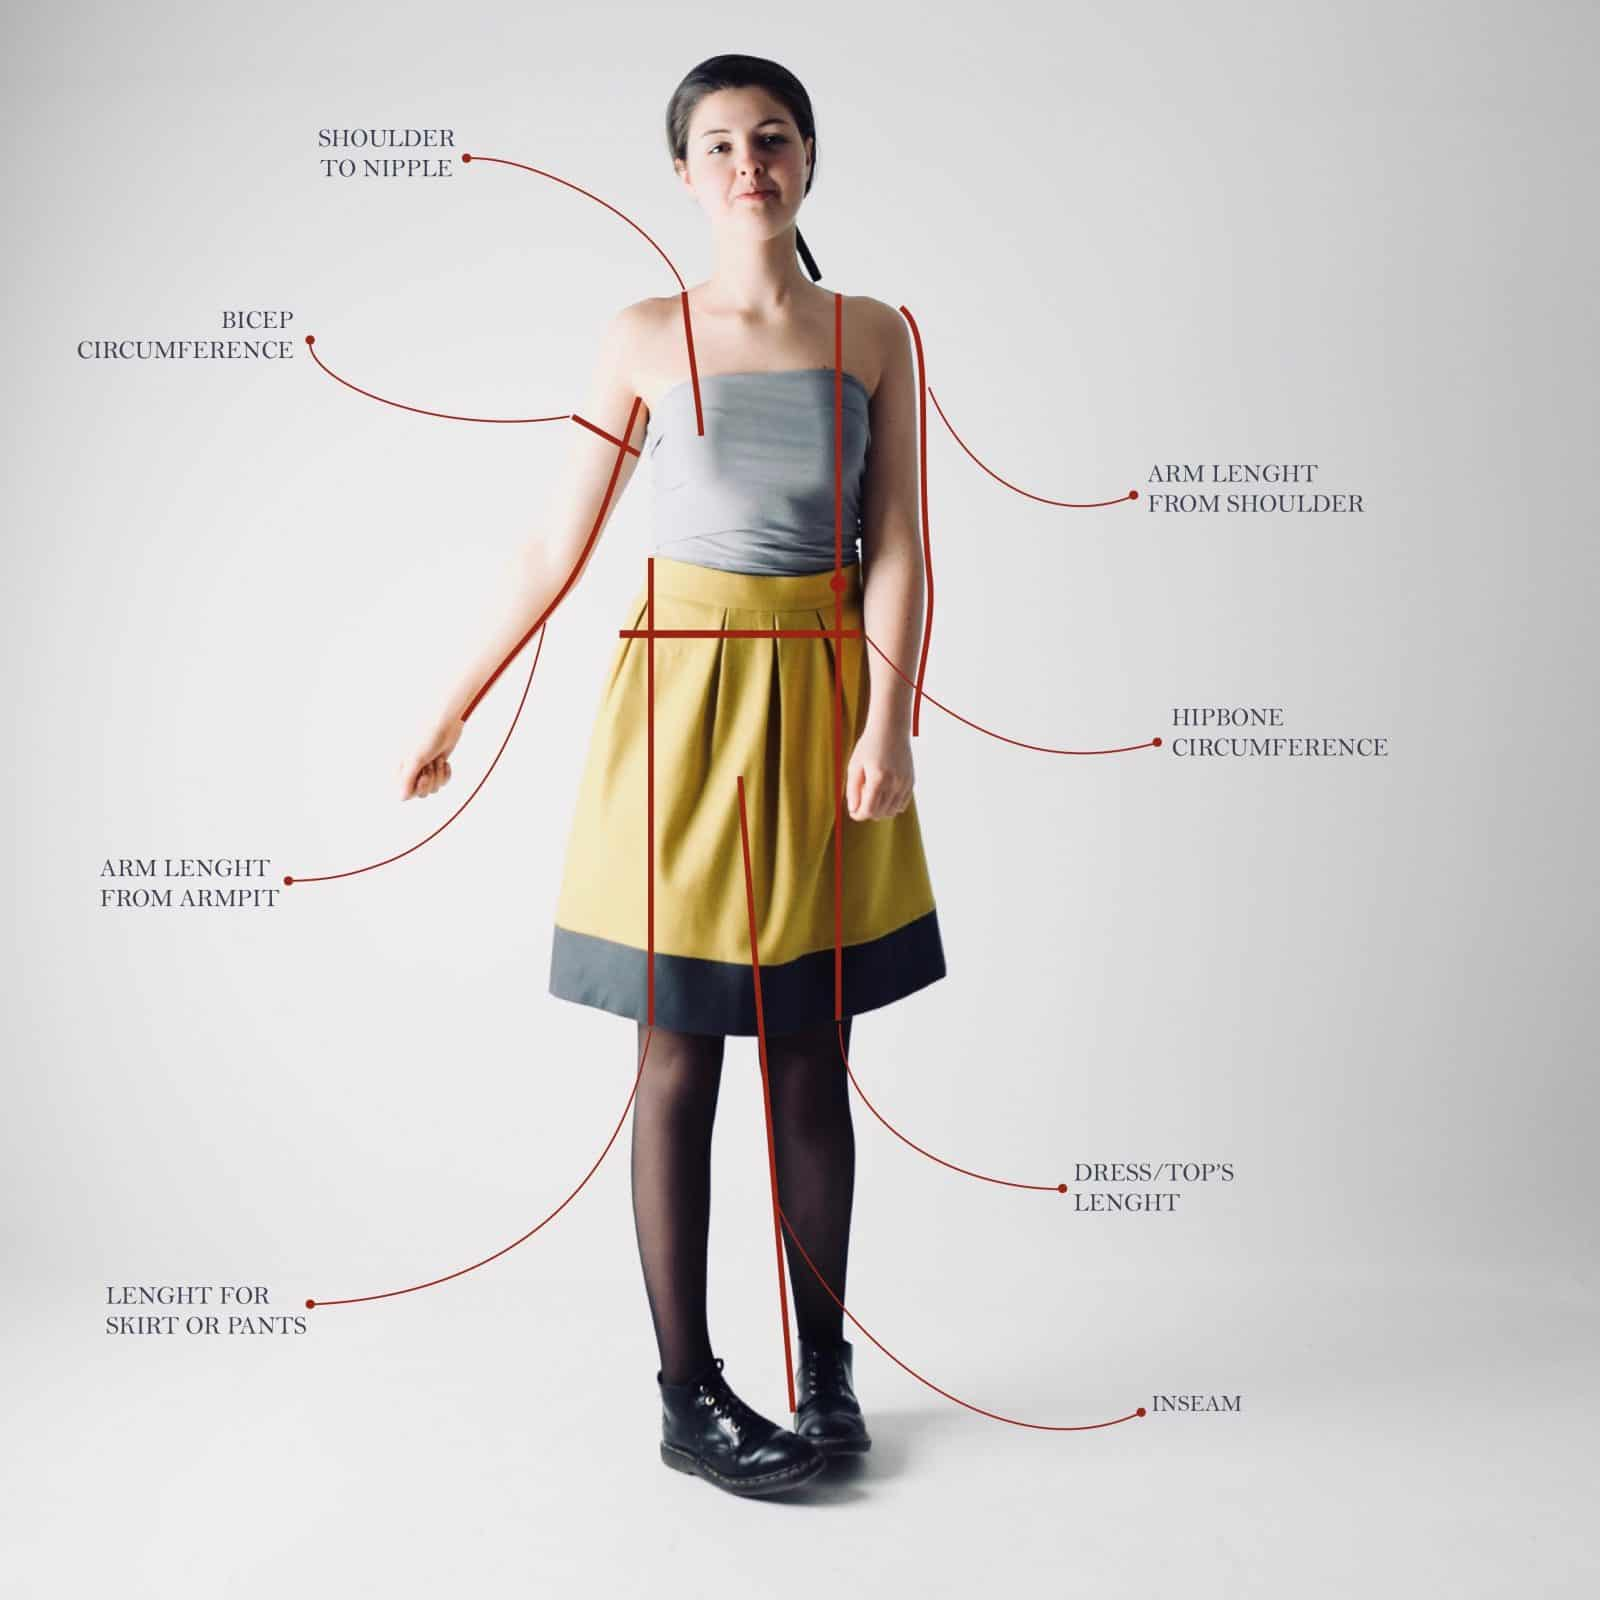 Body-measurements